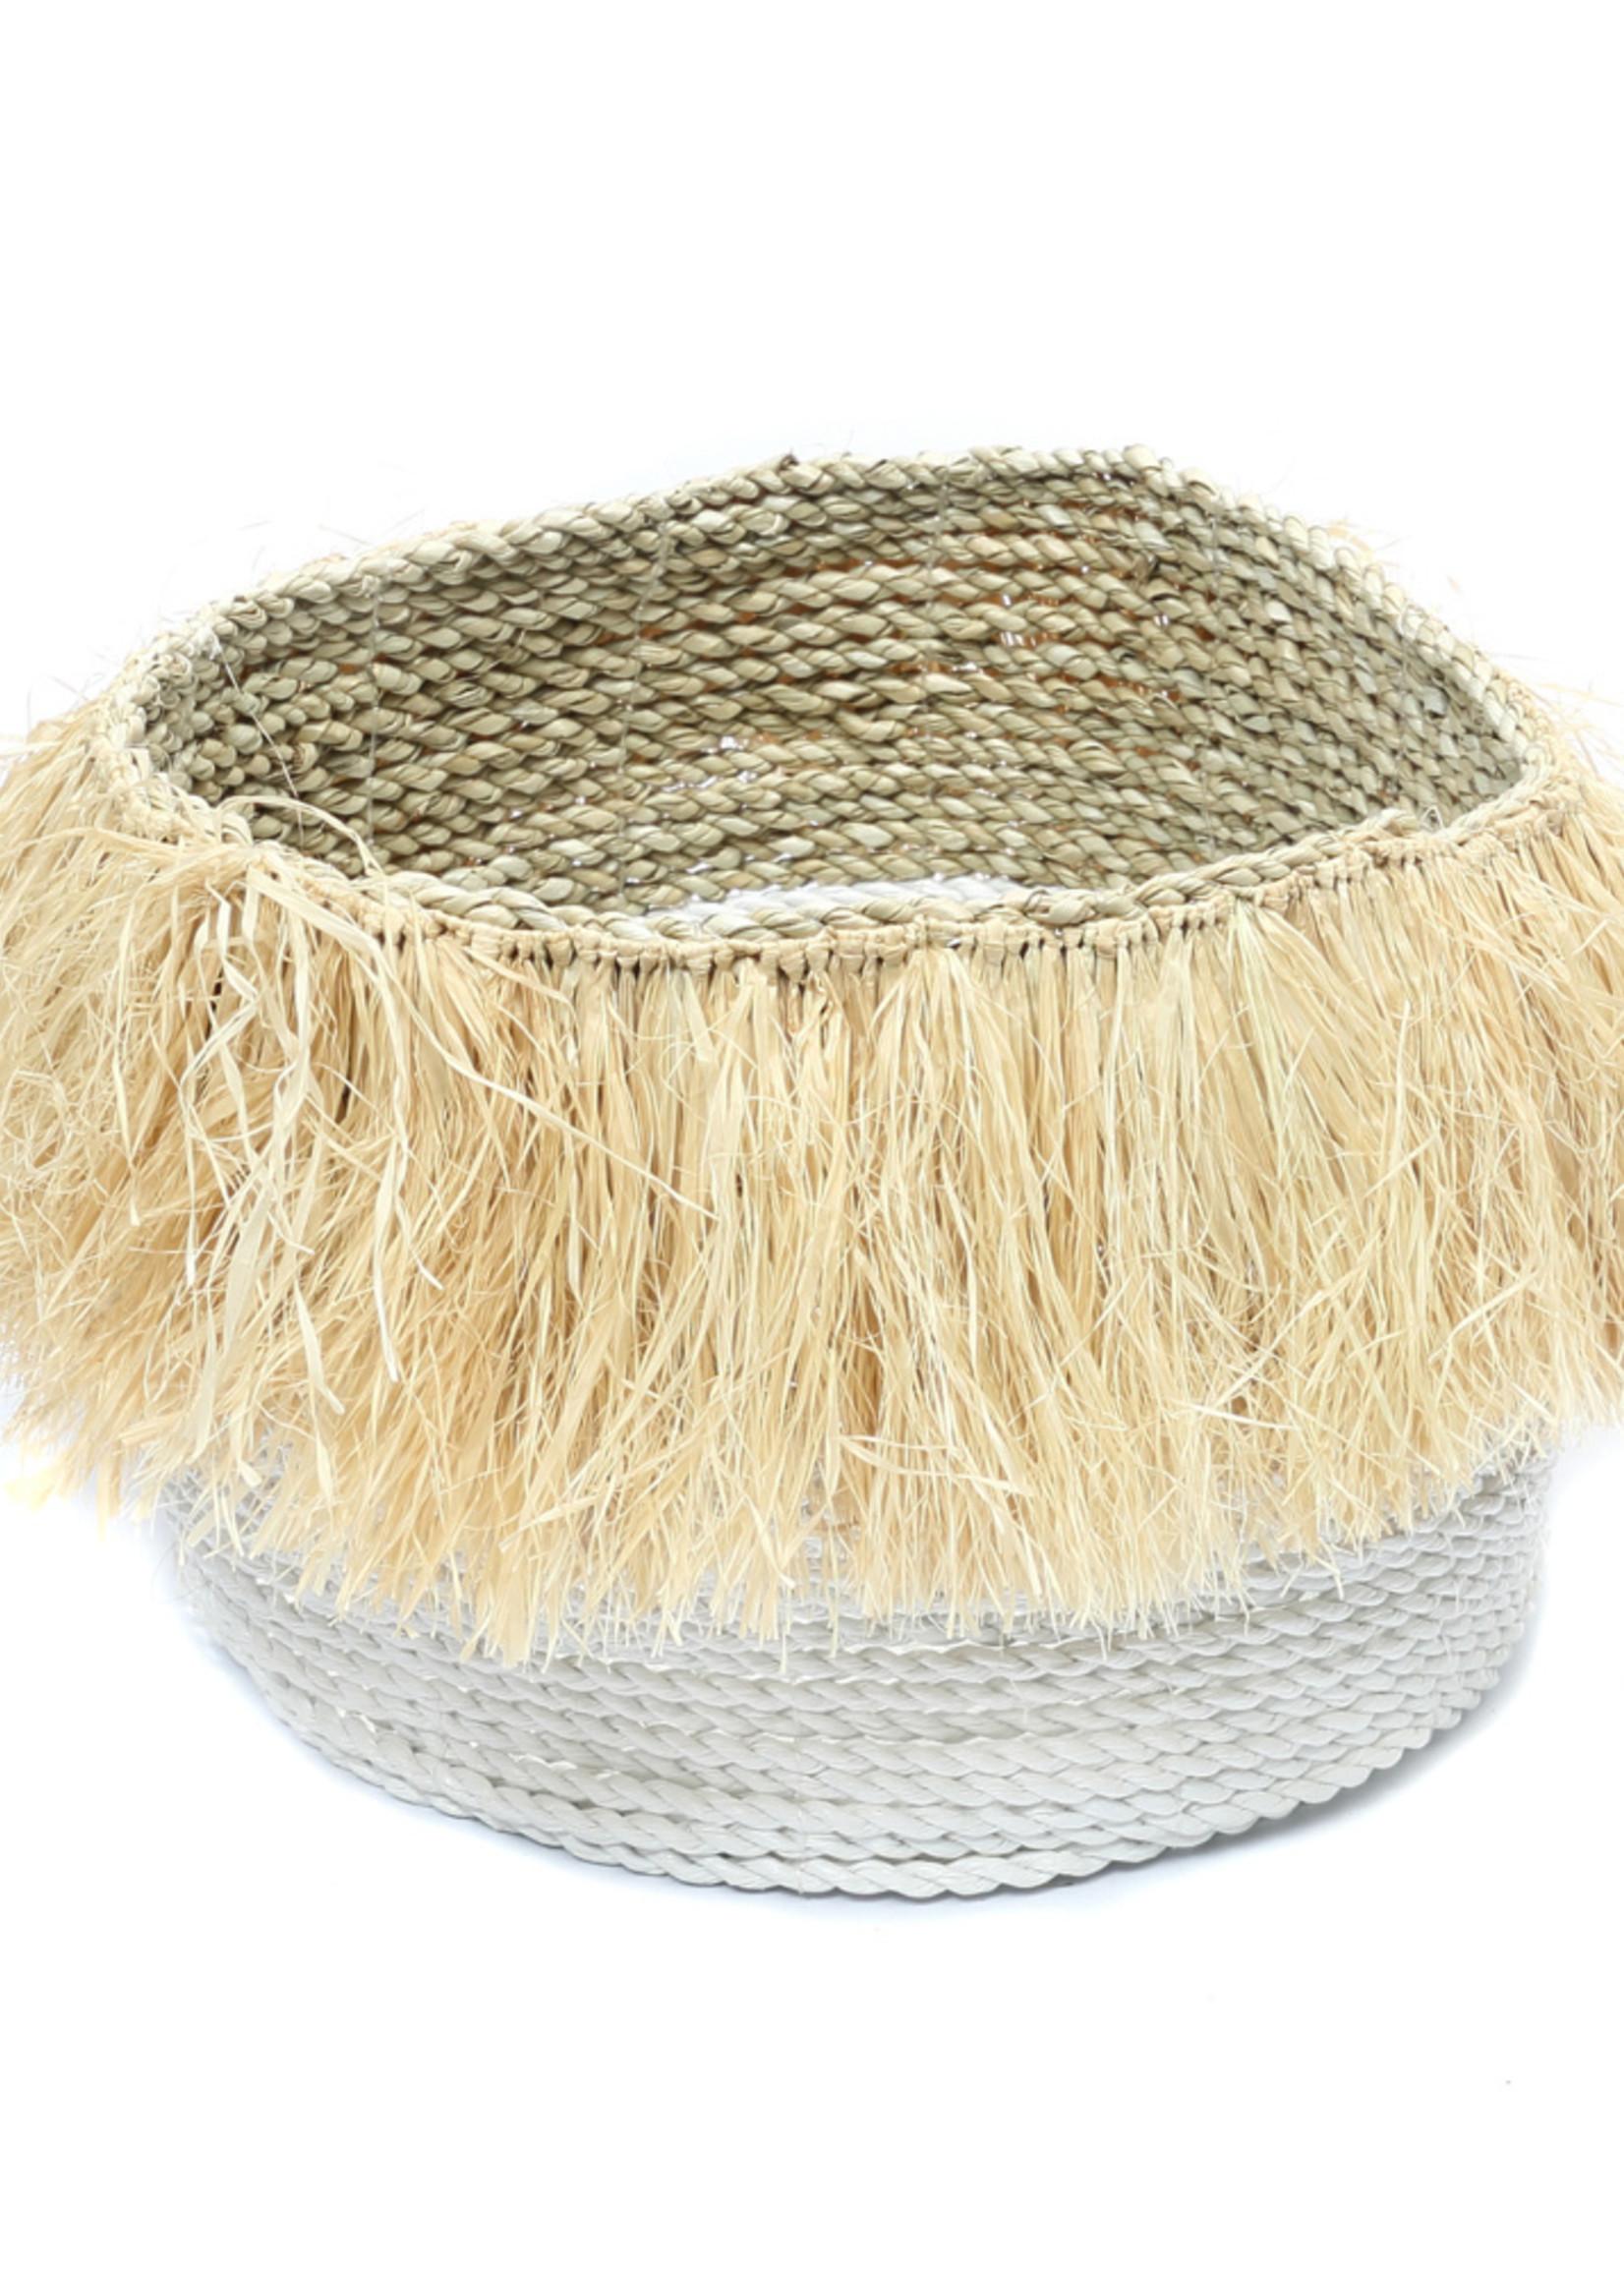 The Aloha Baskets - White Natural - L